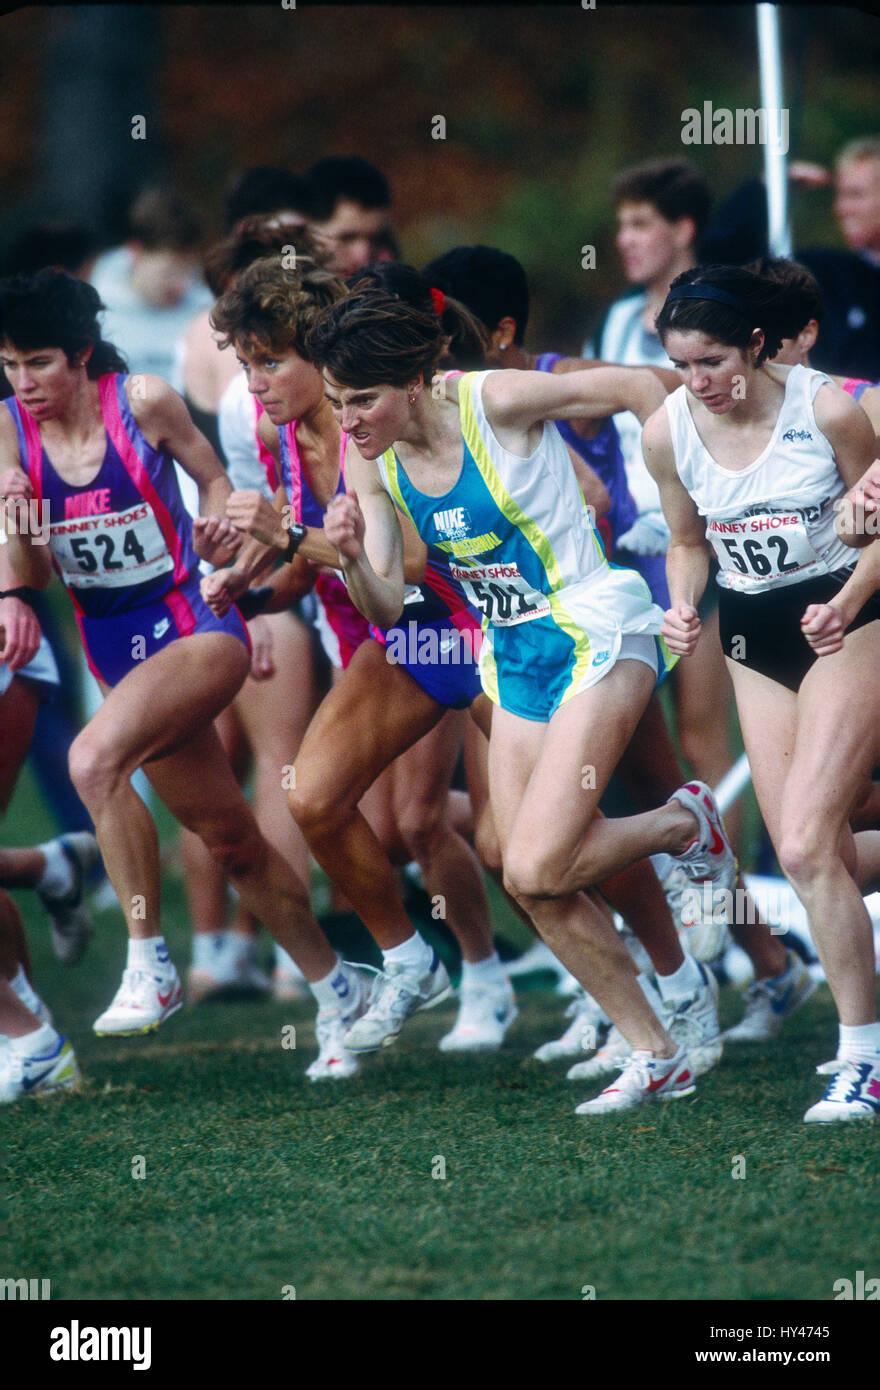 Lynn Jennings wins the 1990 TAC Cross Country Championships, Van Cortland Park, Bronx, NY - Stock Image